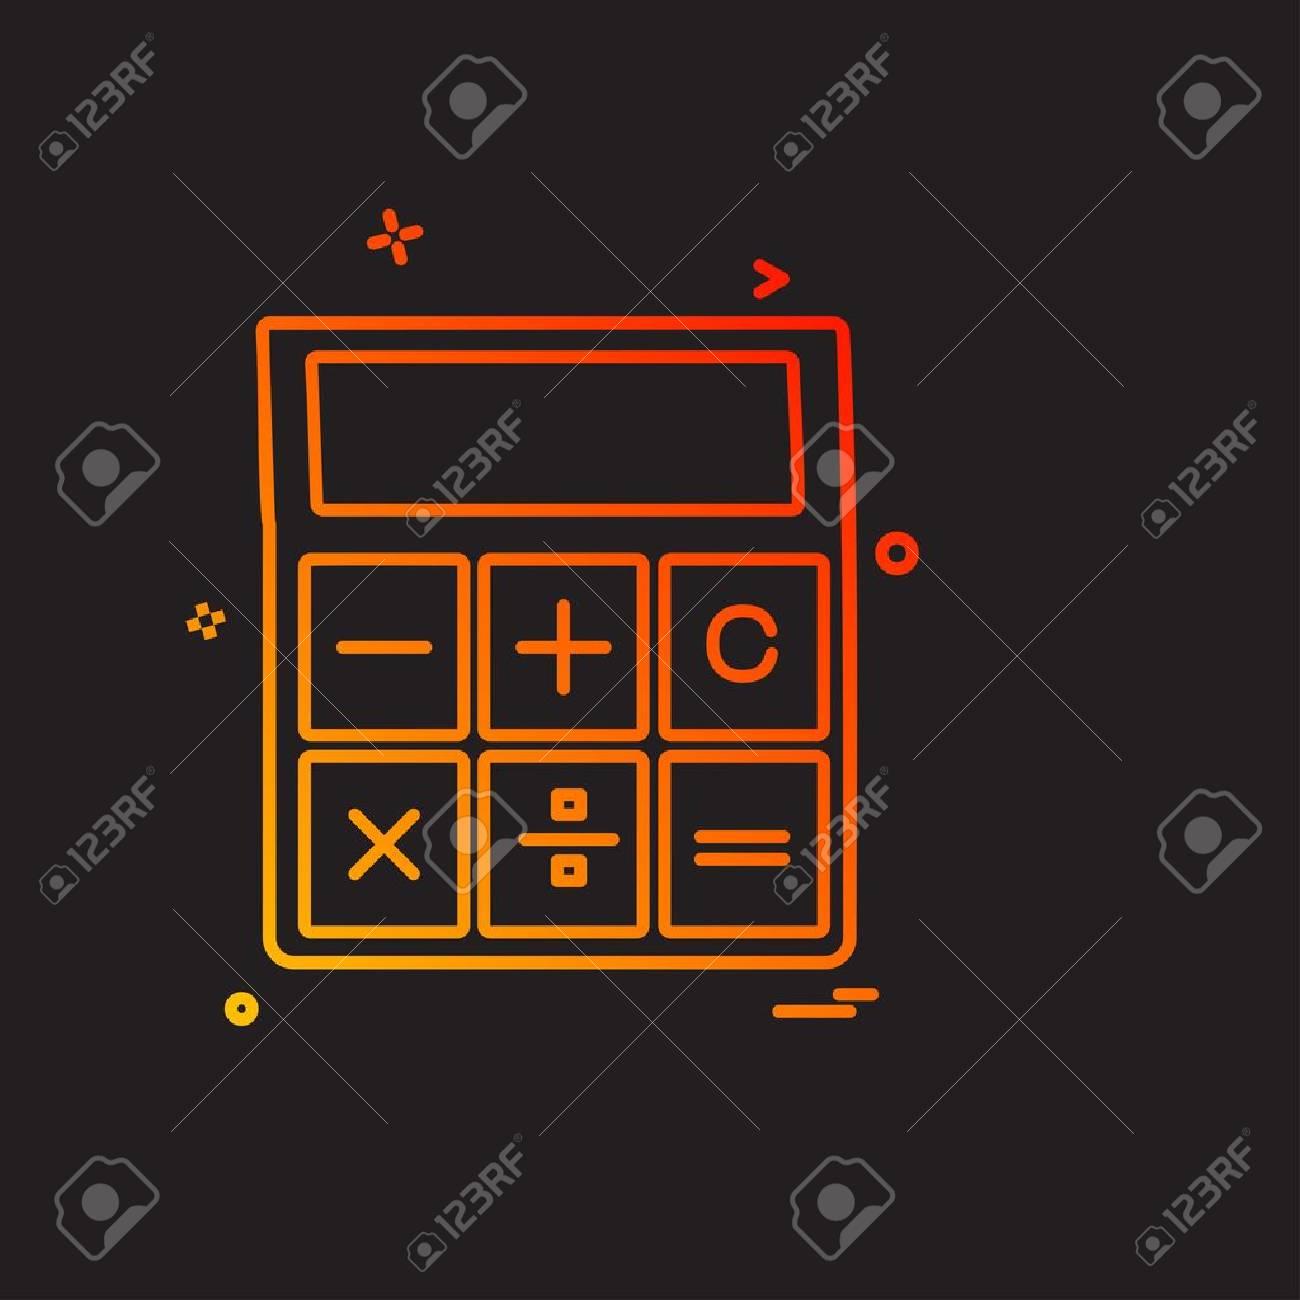 Business icon design vector - 111449770